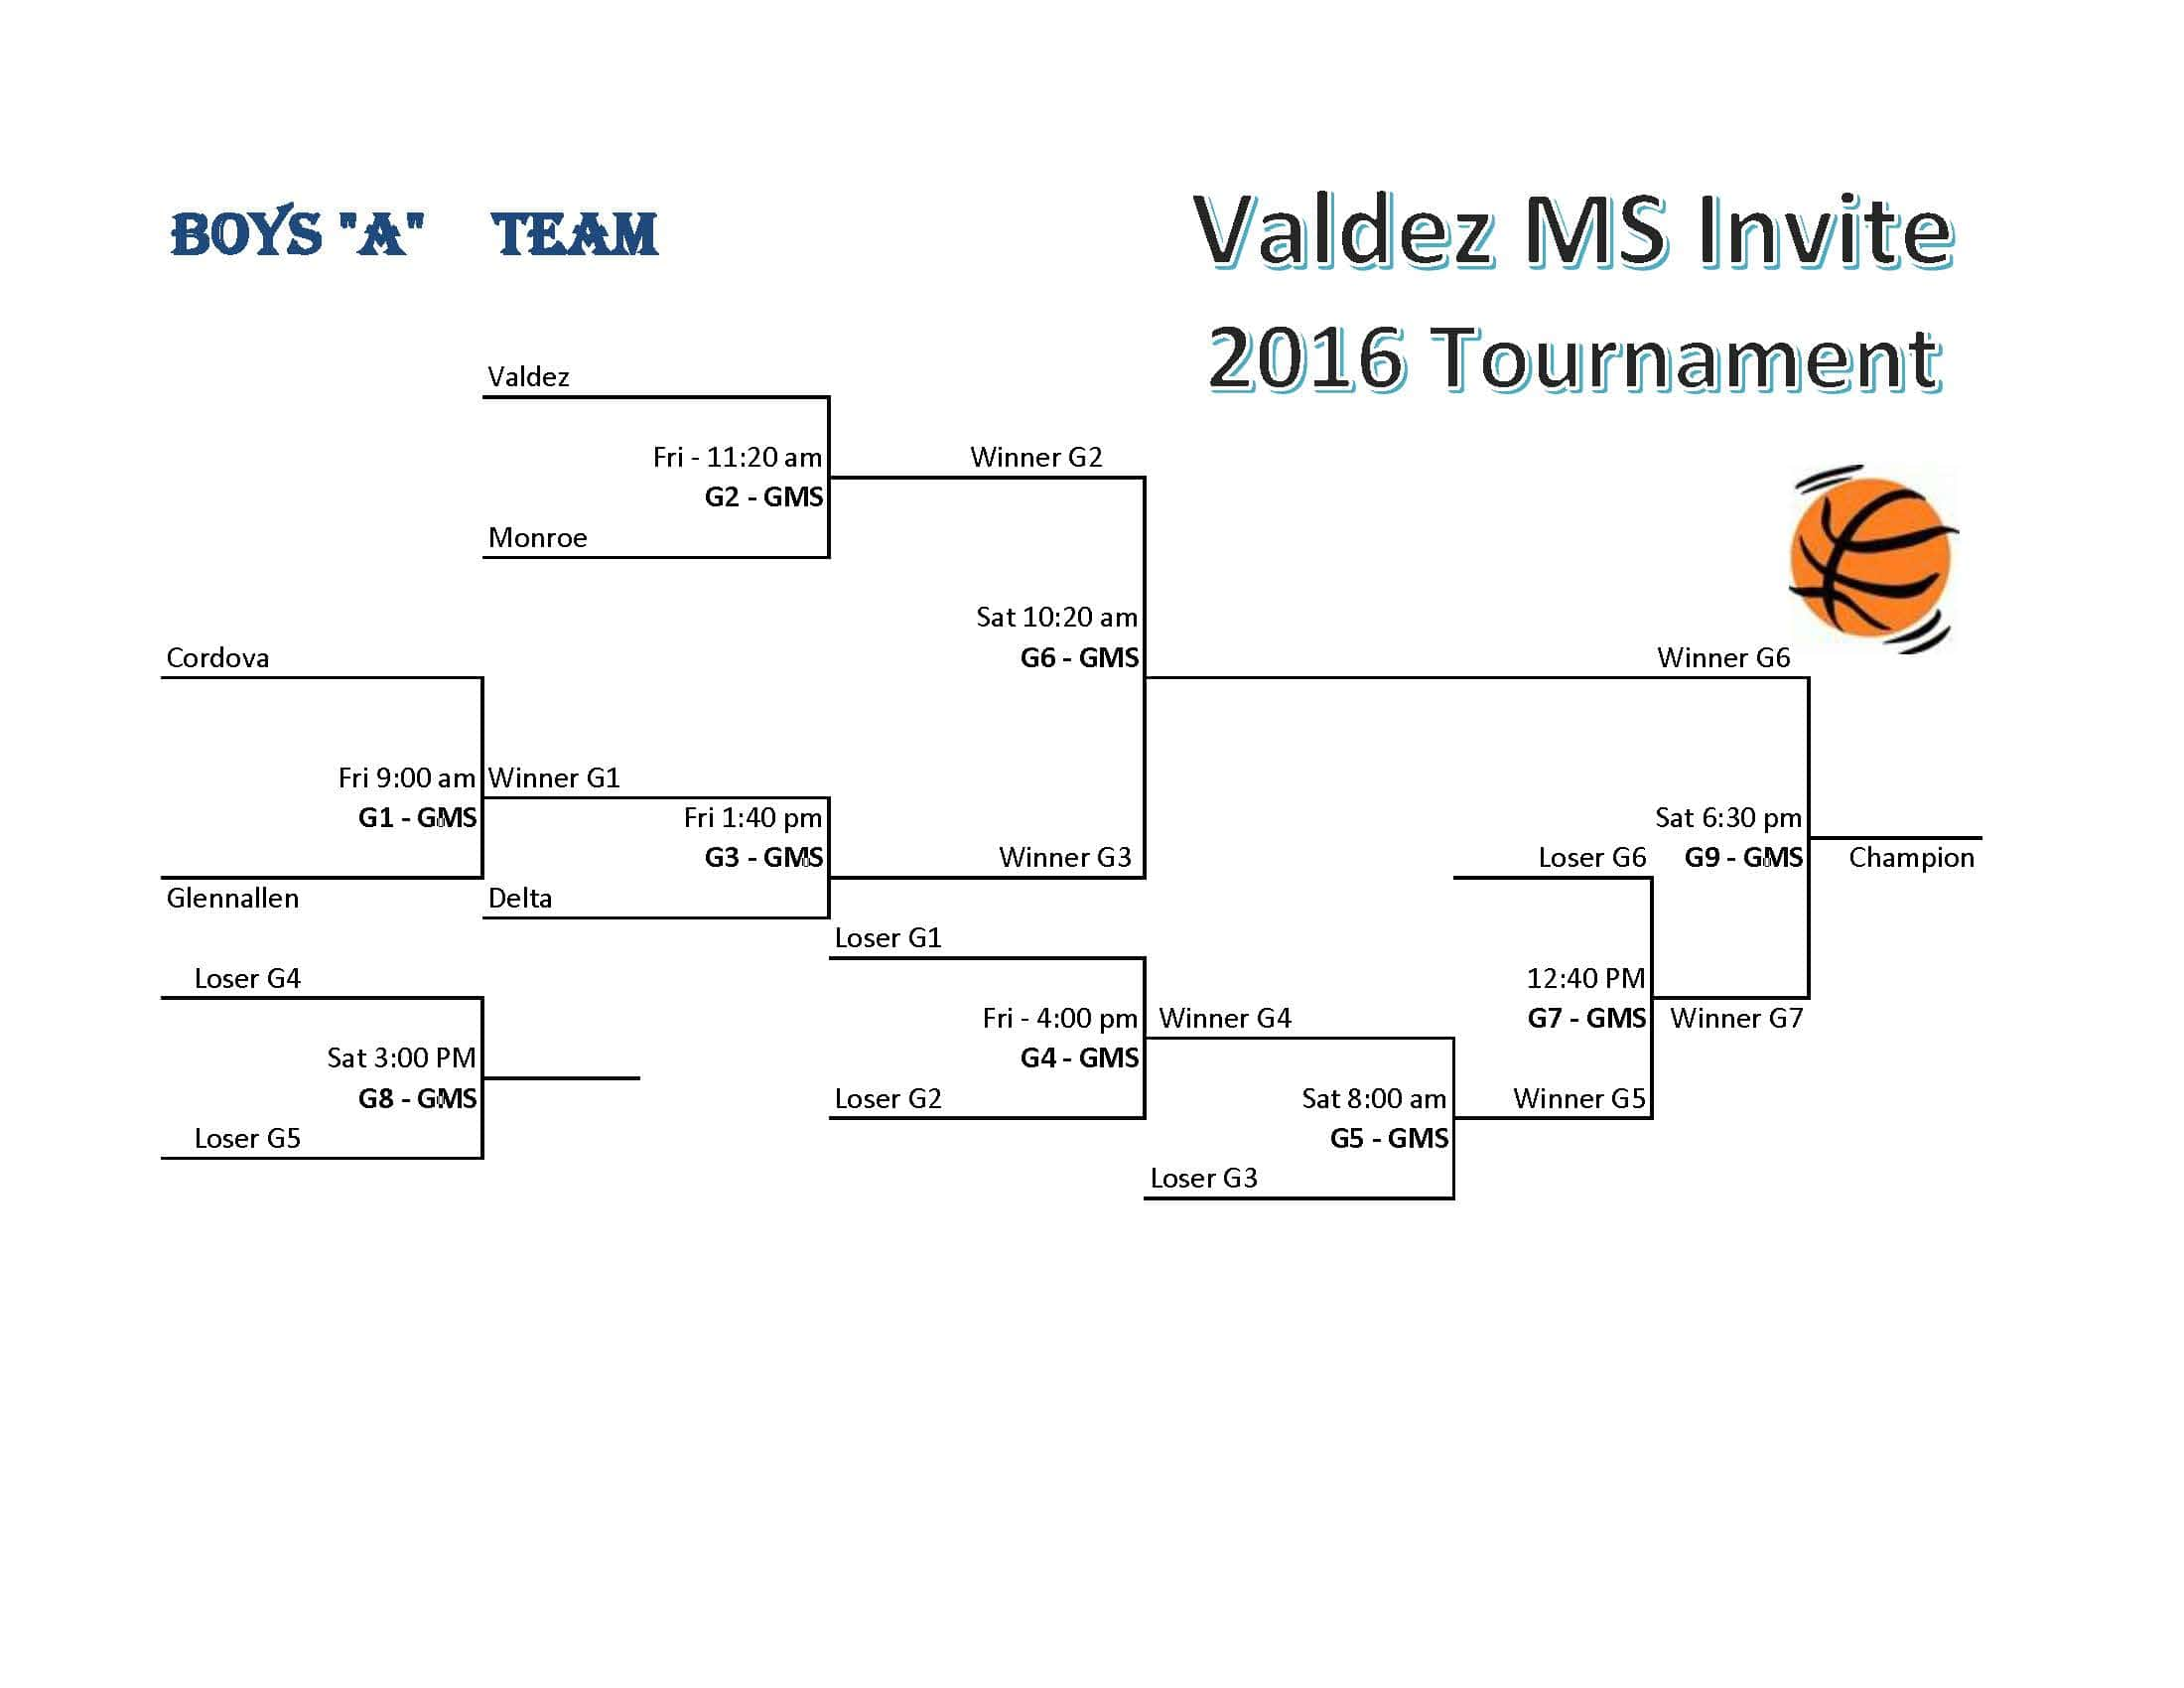 Valdez Tourn Boys A Bracket 2016_Page_1